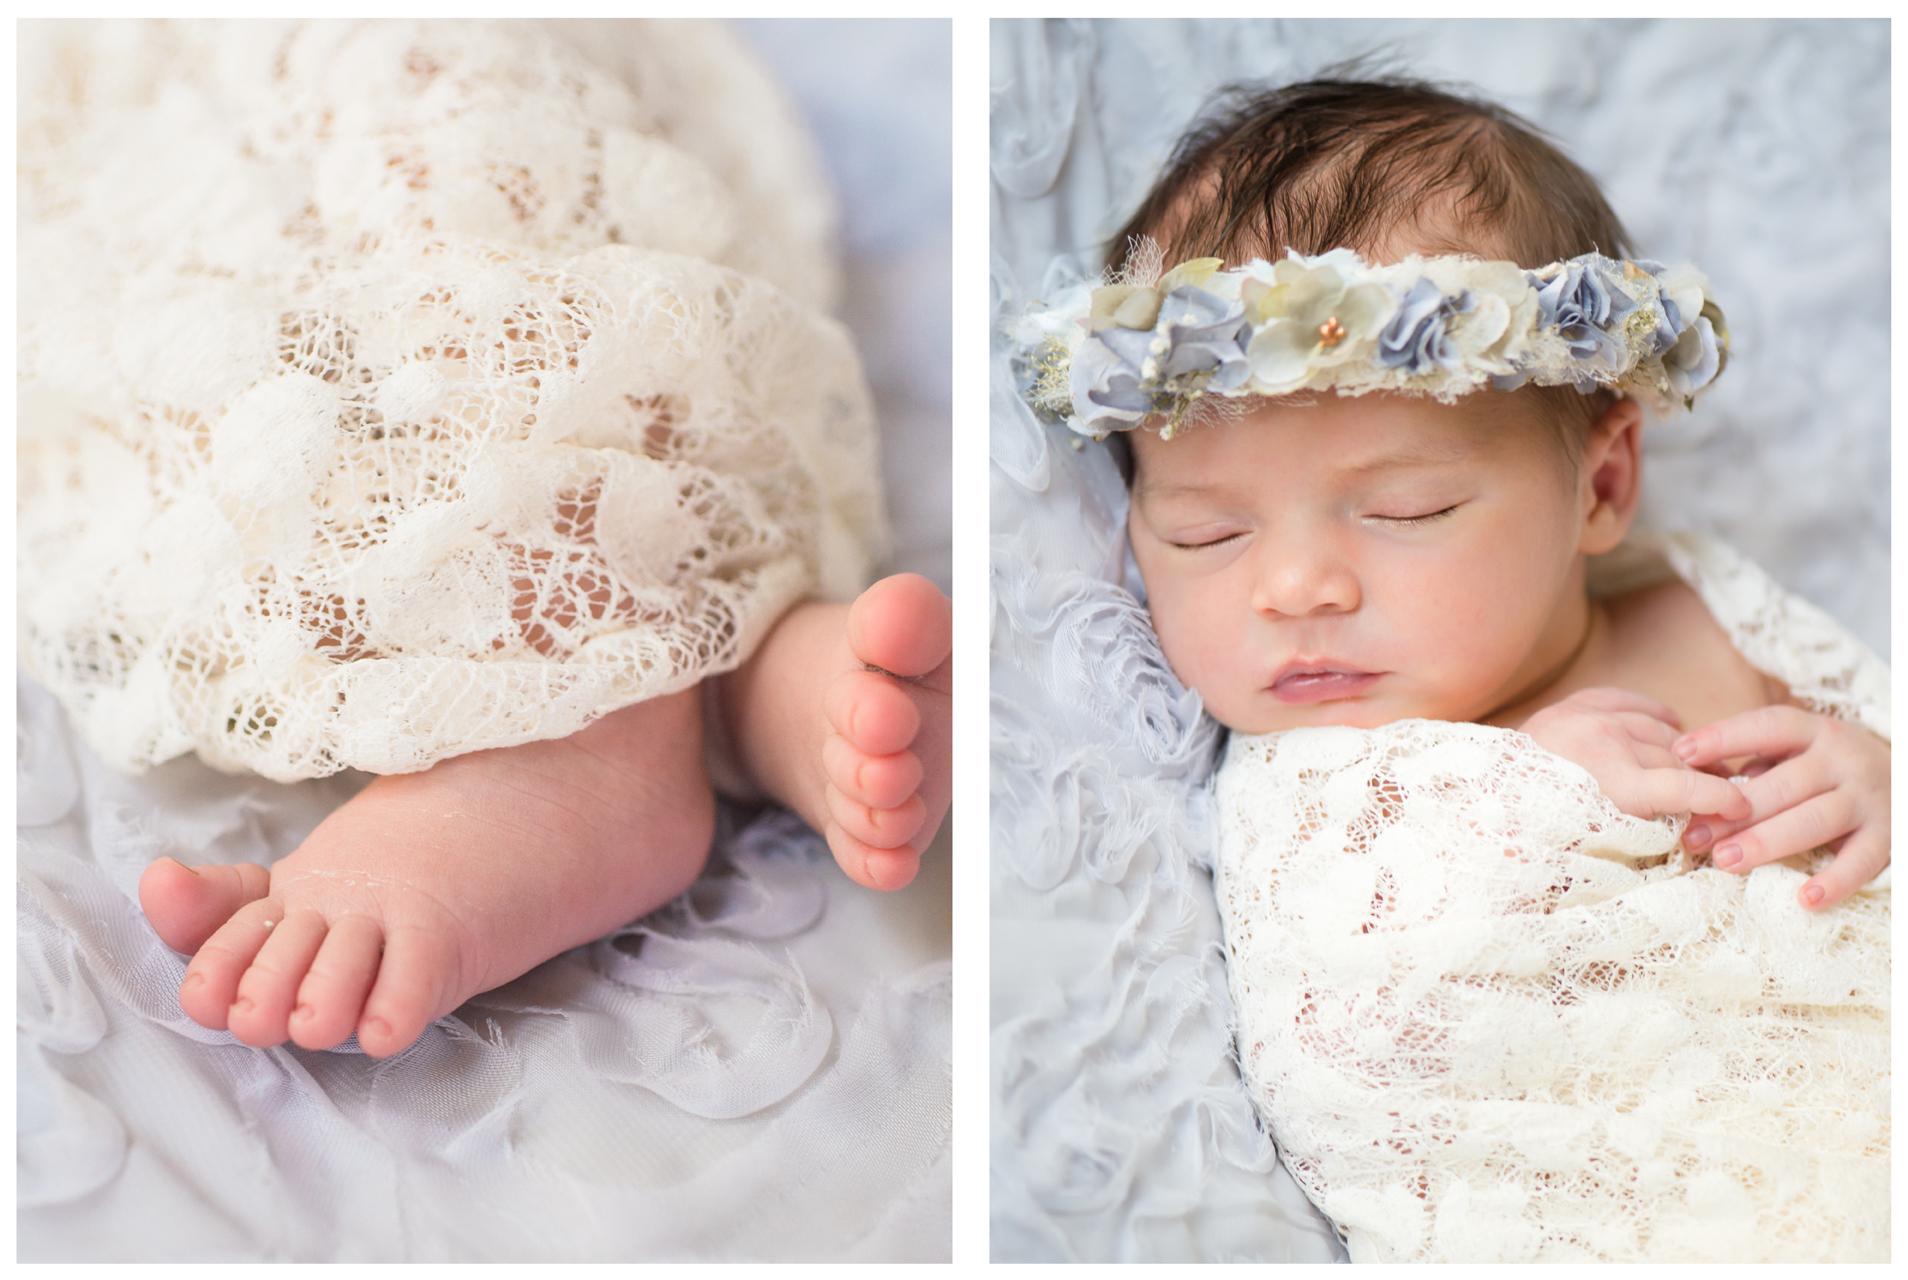 newborn-Photographer-Sweet-Light-Portraits95.jpg